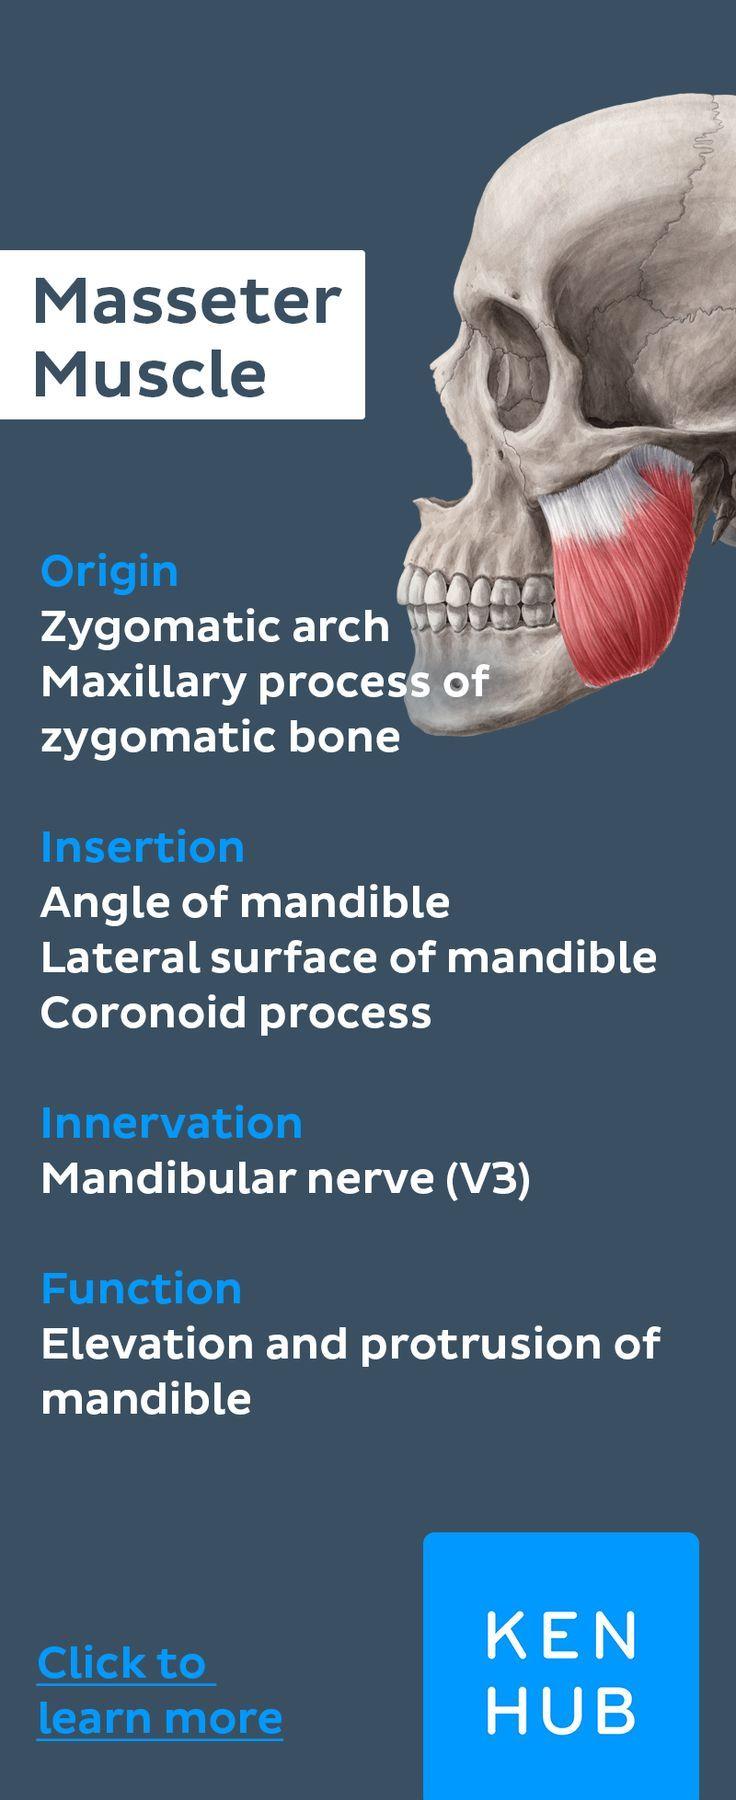 Masseter Muscle Anatomy Muscle Anatomy Muscle Anatomy